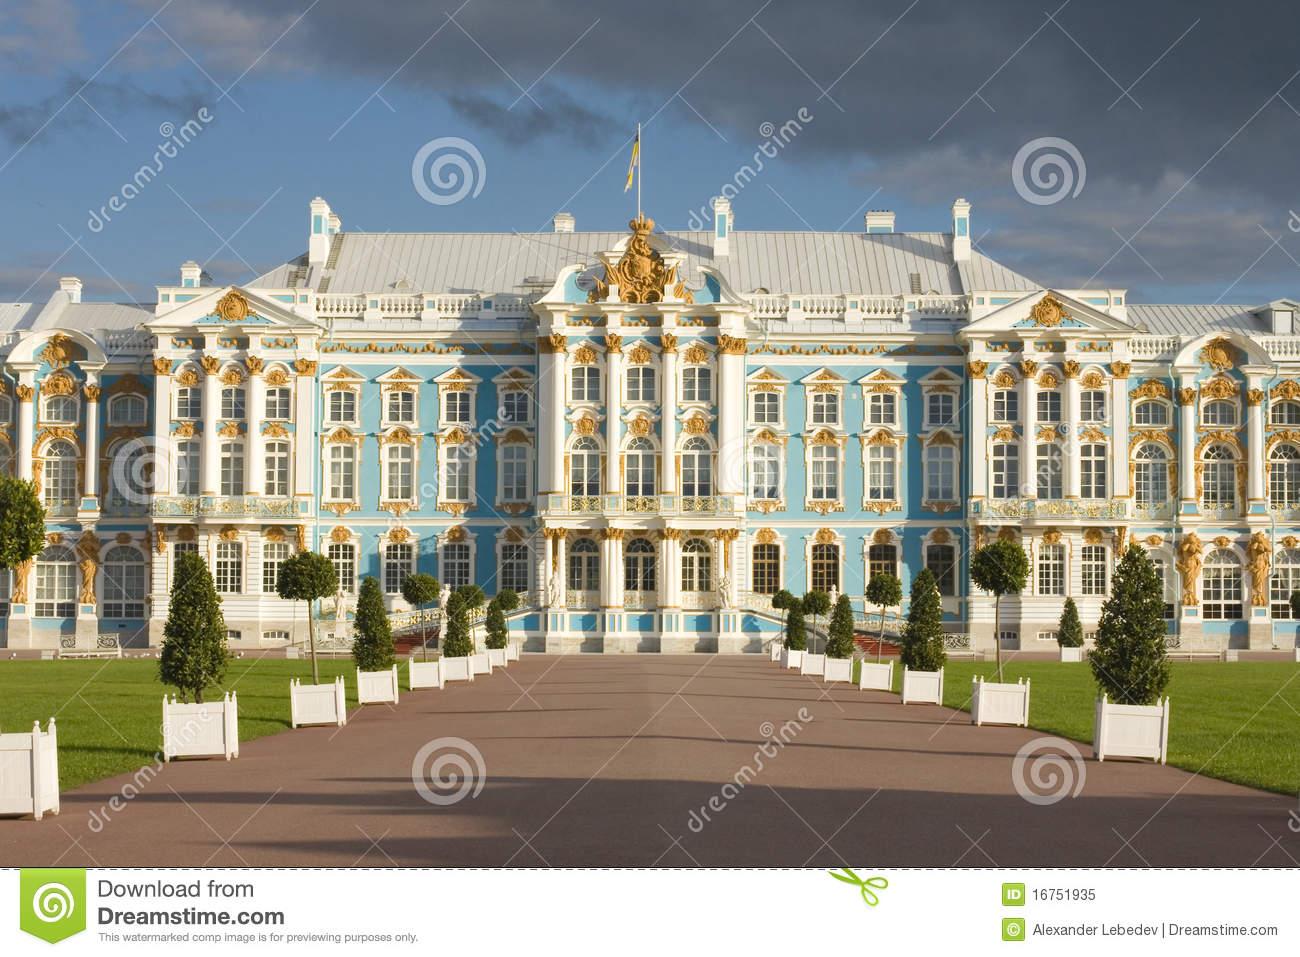 Catherine Palace In Tsarskoe Selo, Russia Royalty Free Stock Photo.